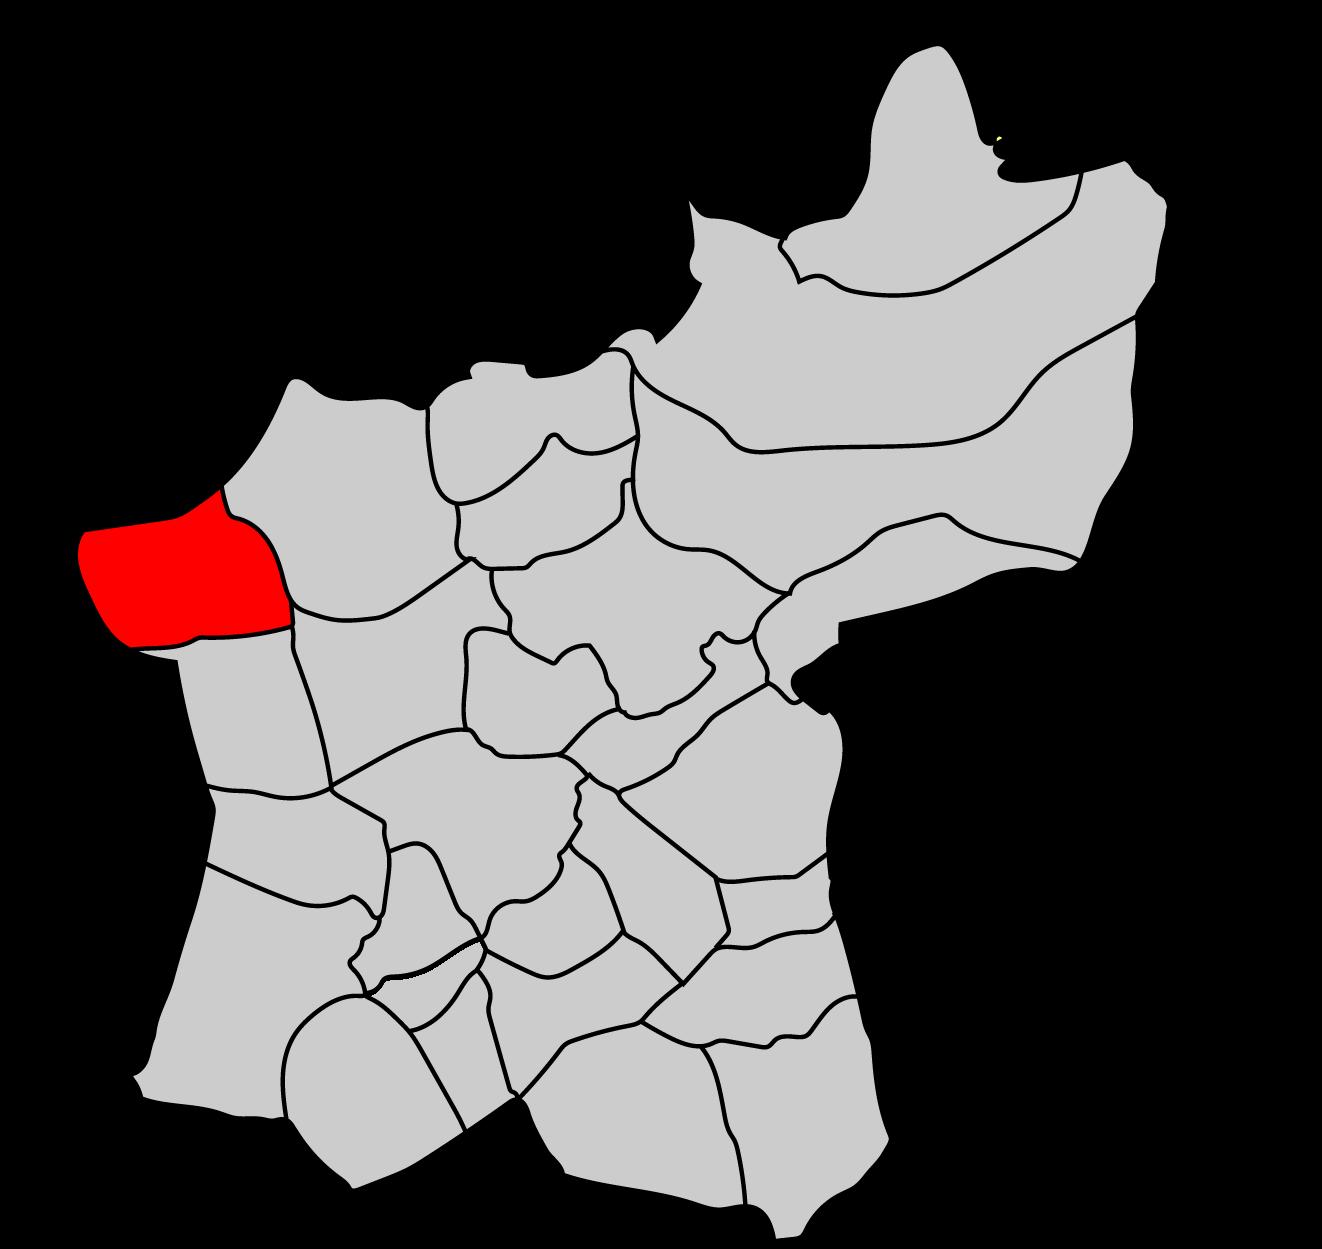 sobrado mapa File:Mapa parroquia sobrado baralla.png   Wikimedia Commons sobrado mapa